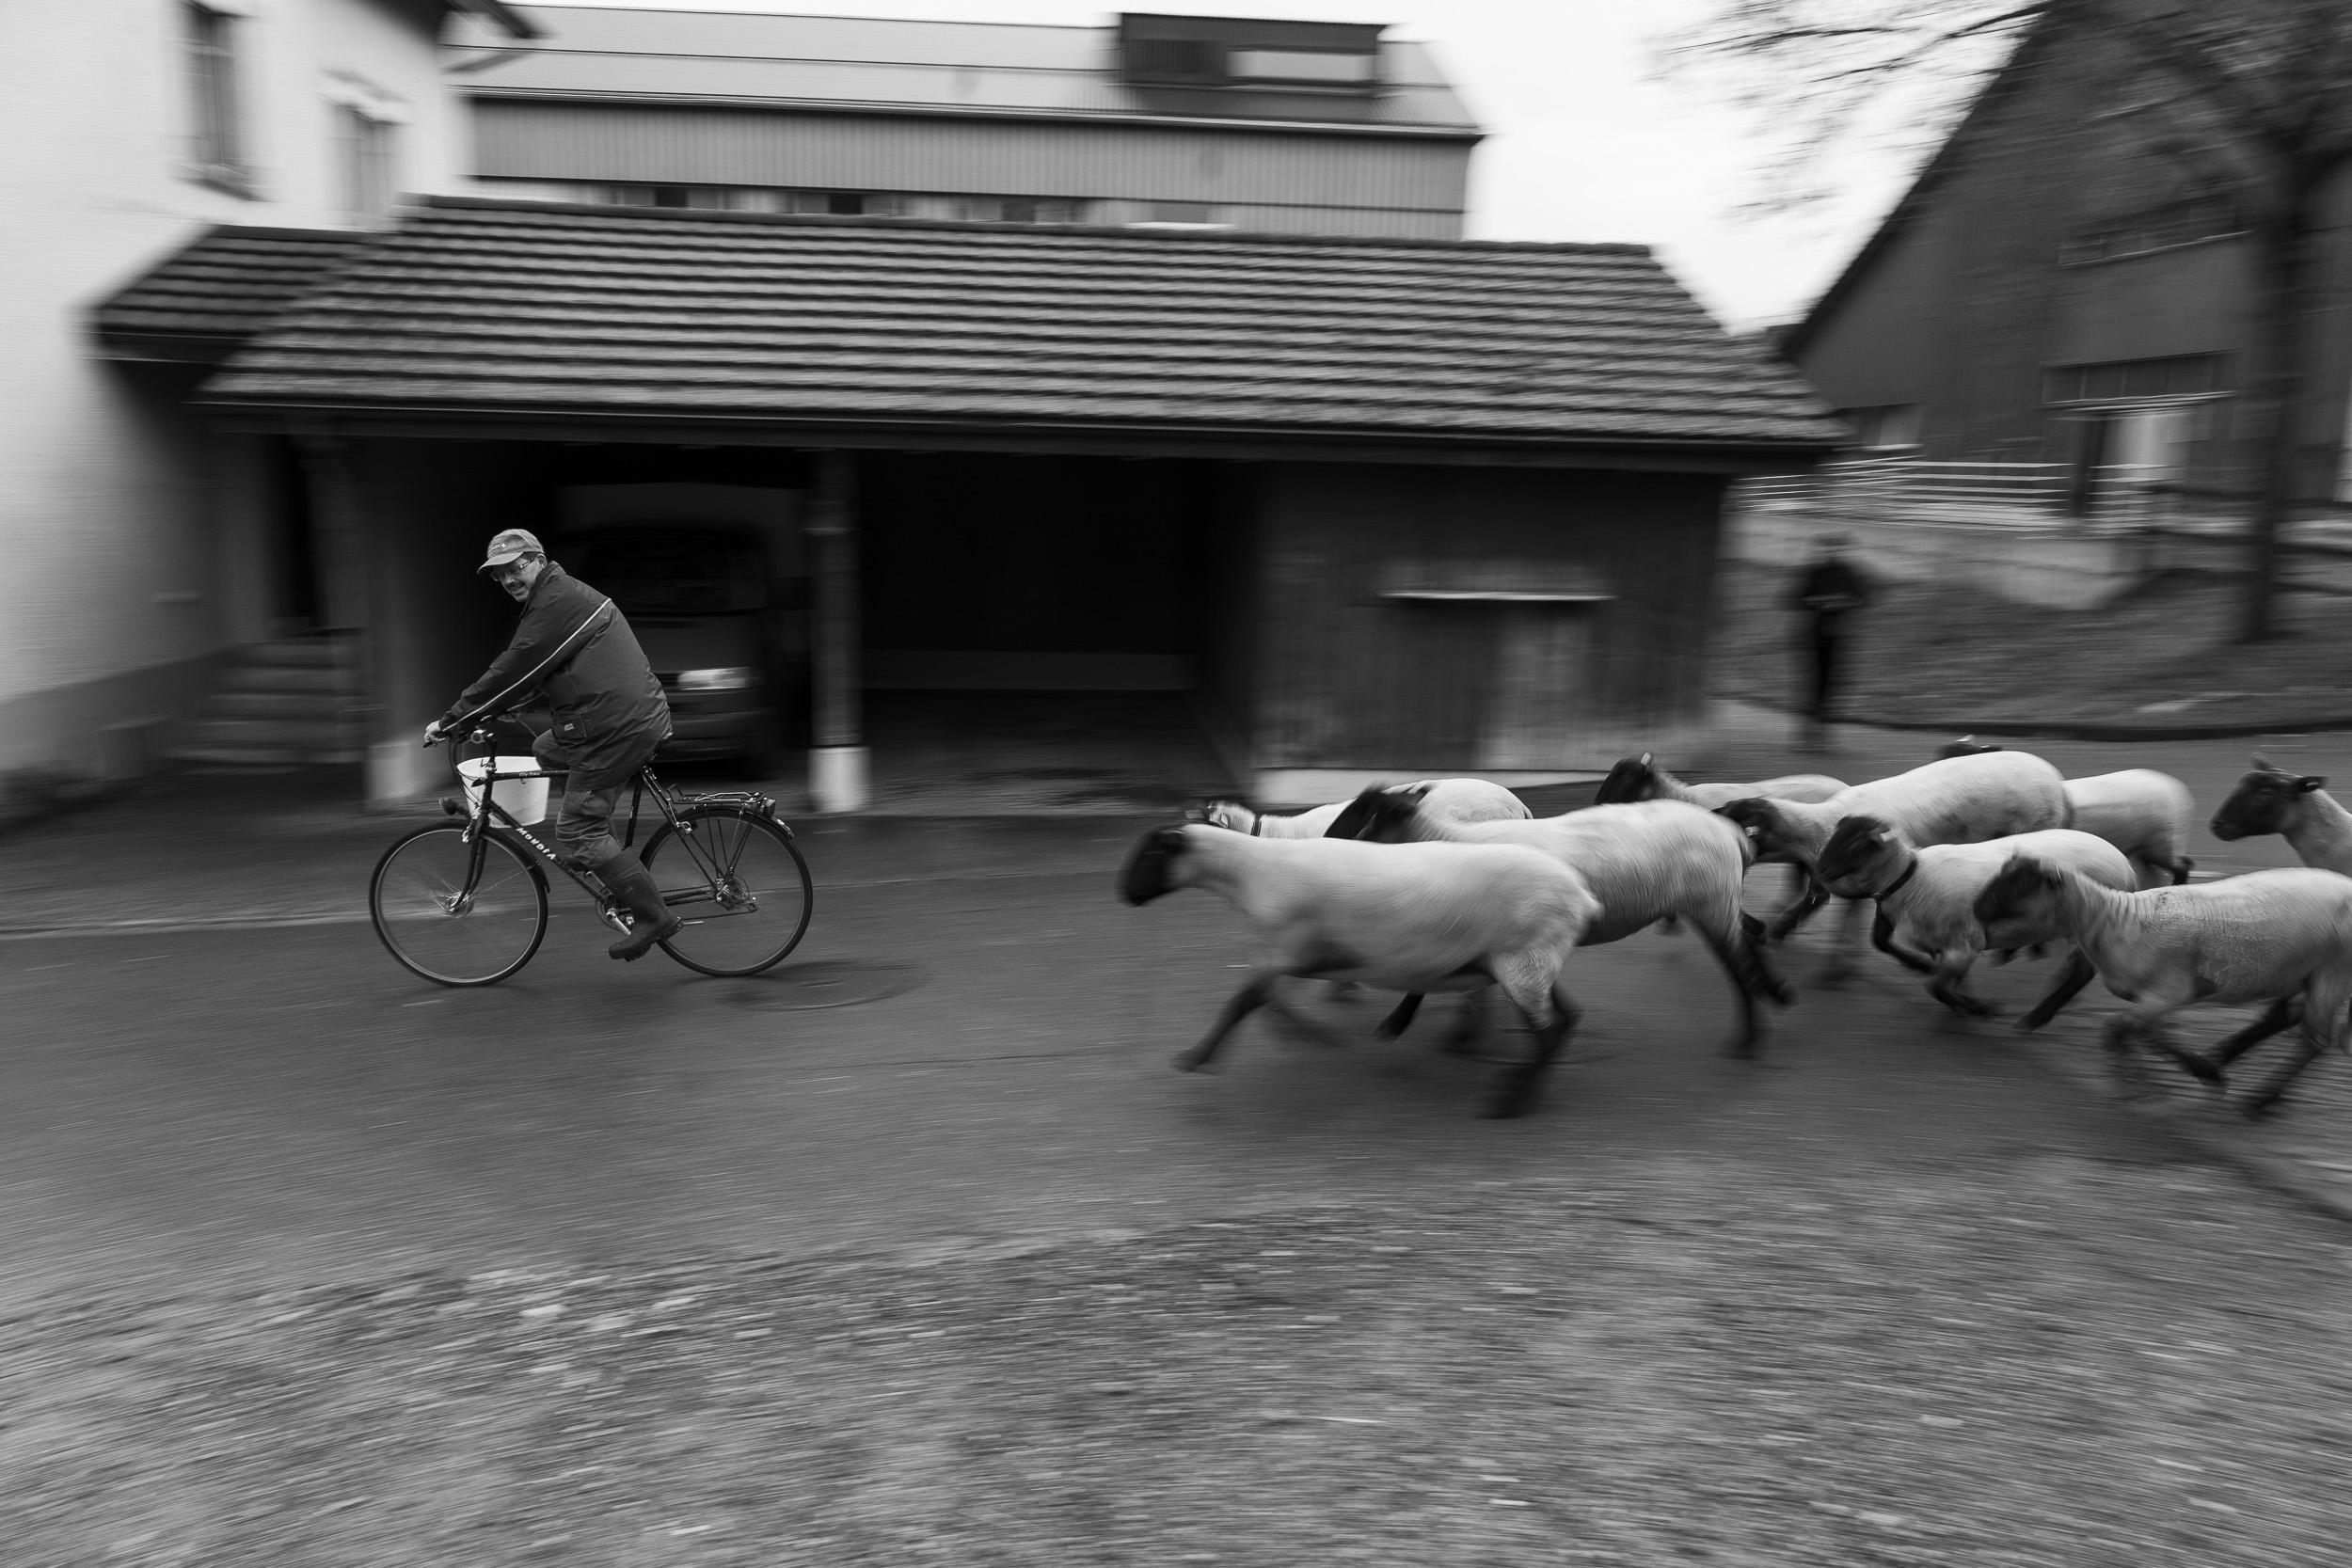 Foto: Peter Schäublin /Leica SL / Vario-Elmarit SL 2.8 24-90 ASPH auf 24 mm / 1/30 sec. f 10 125 ISO